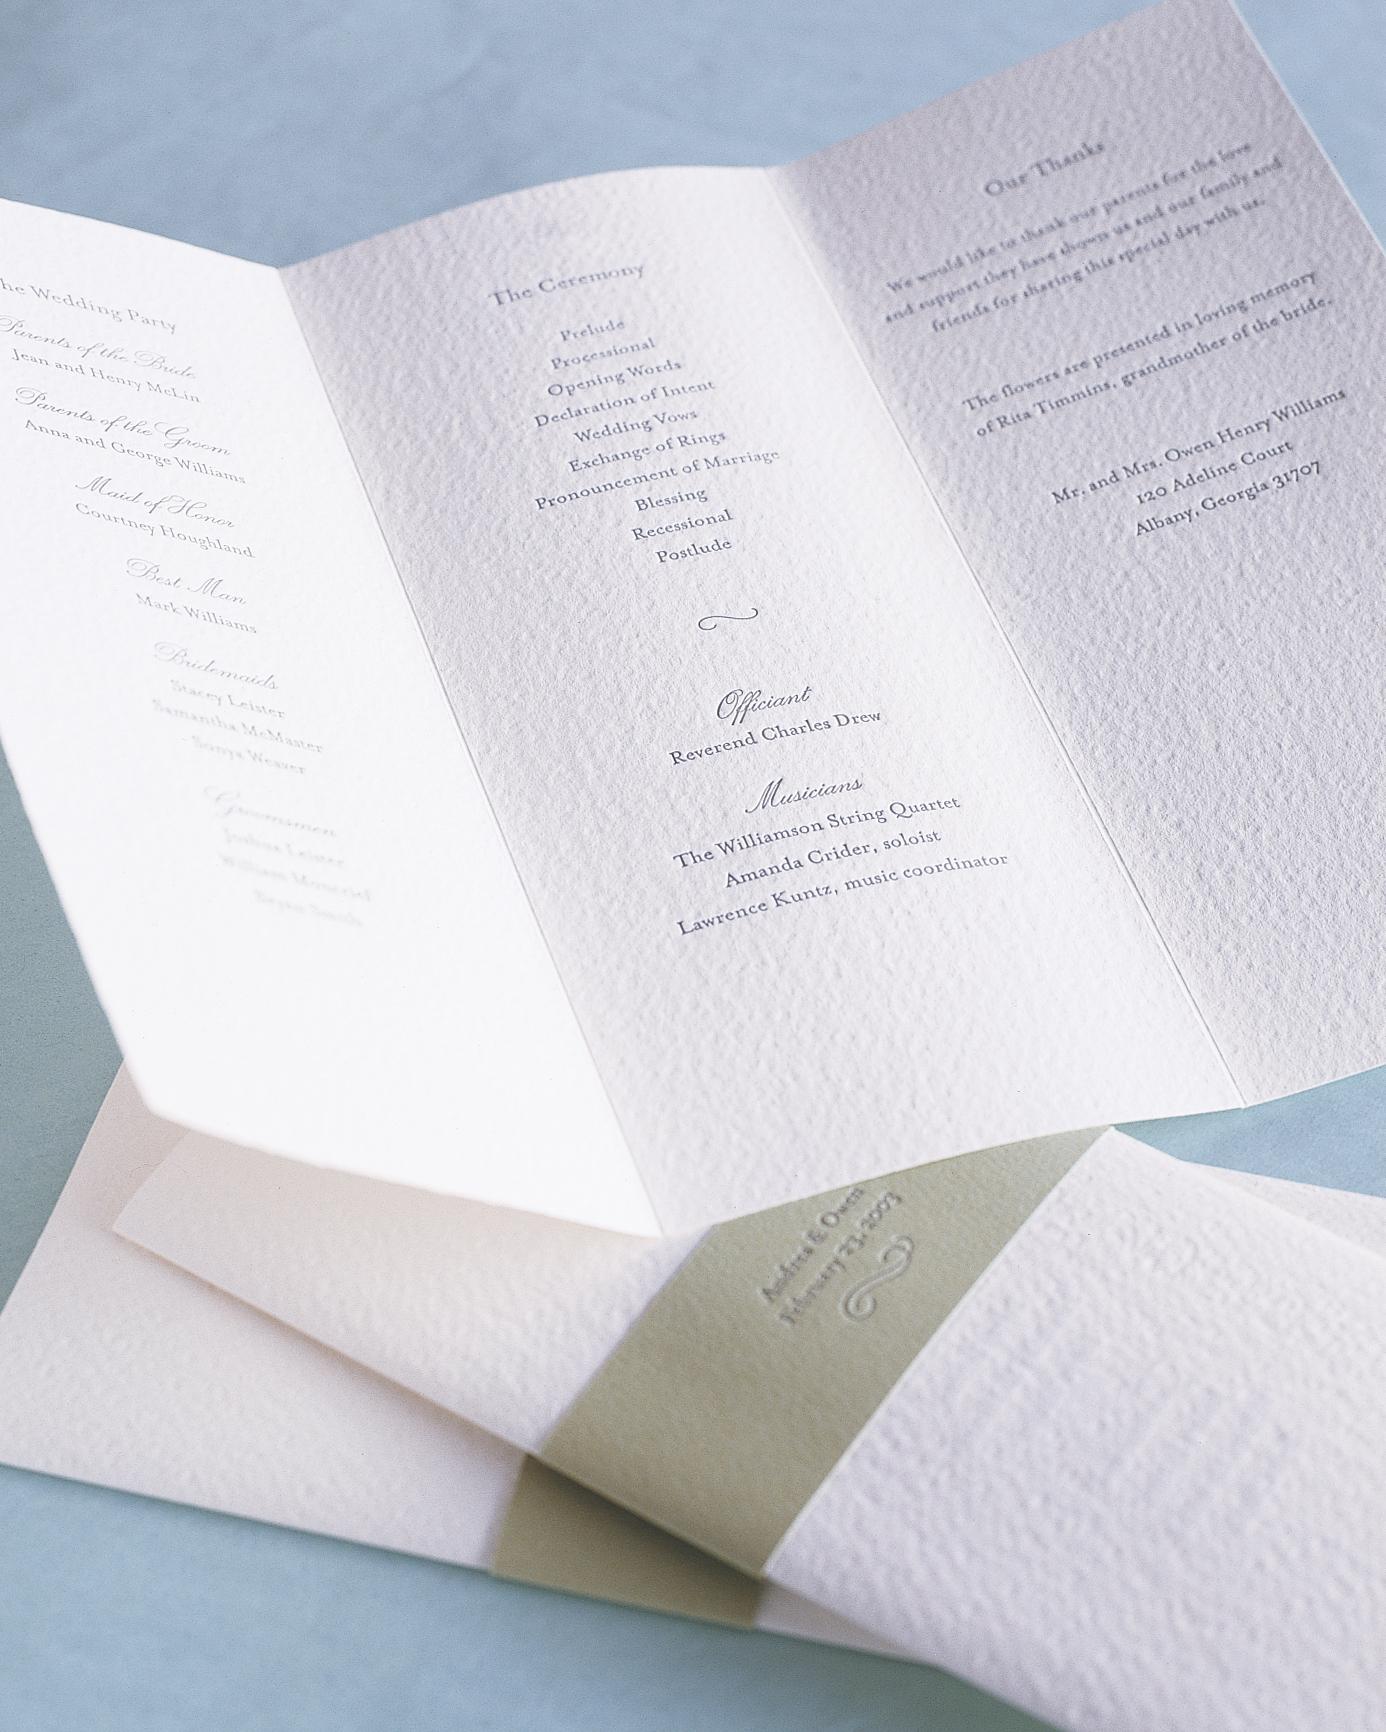 diy-wedding-ceremony-programs-ml083a08-0515.jpg